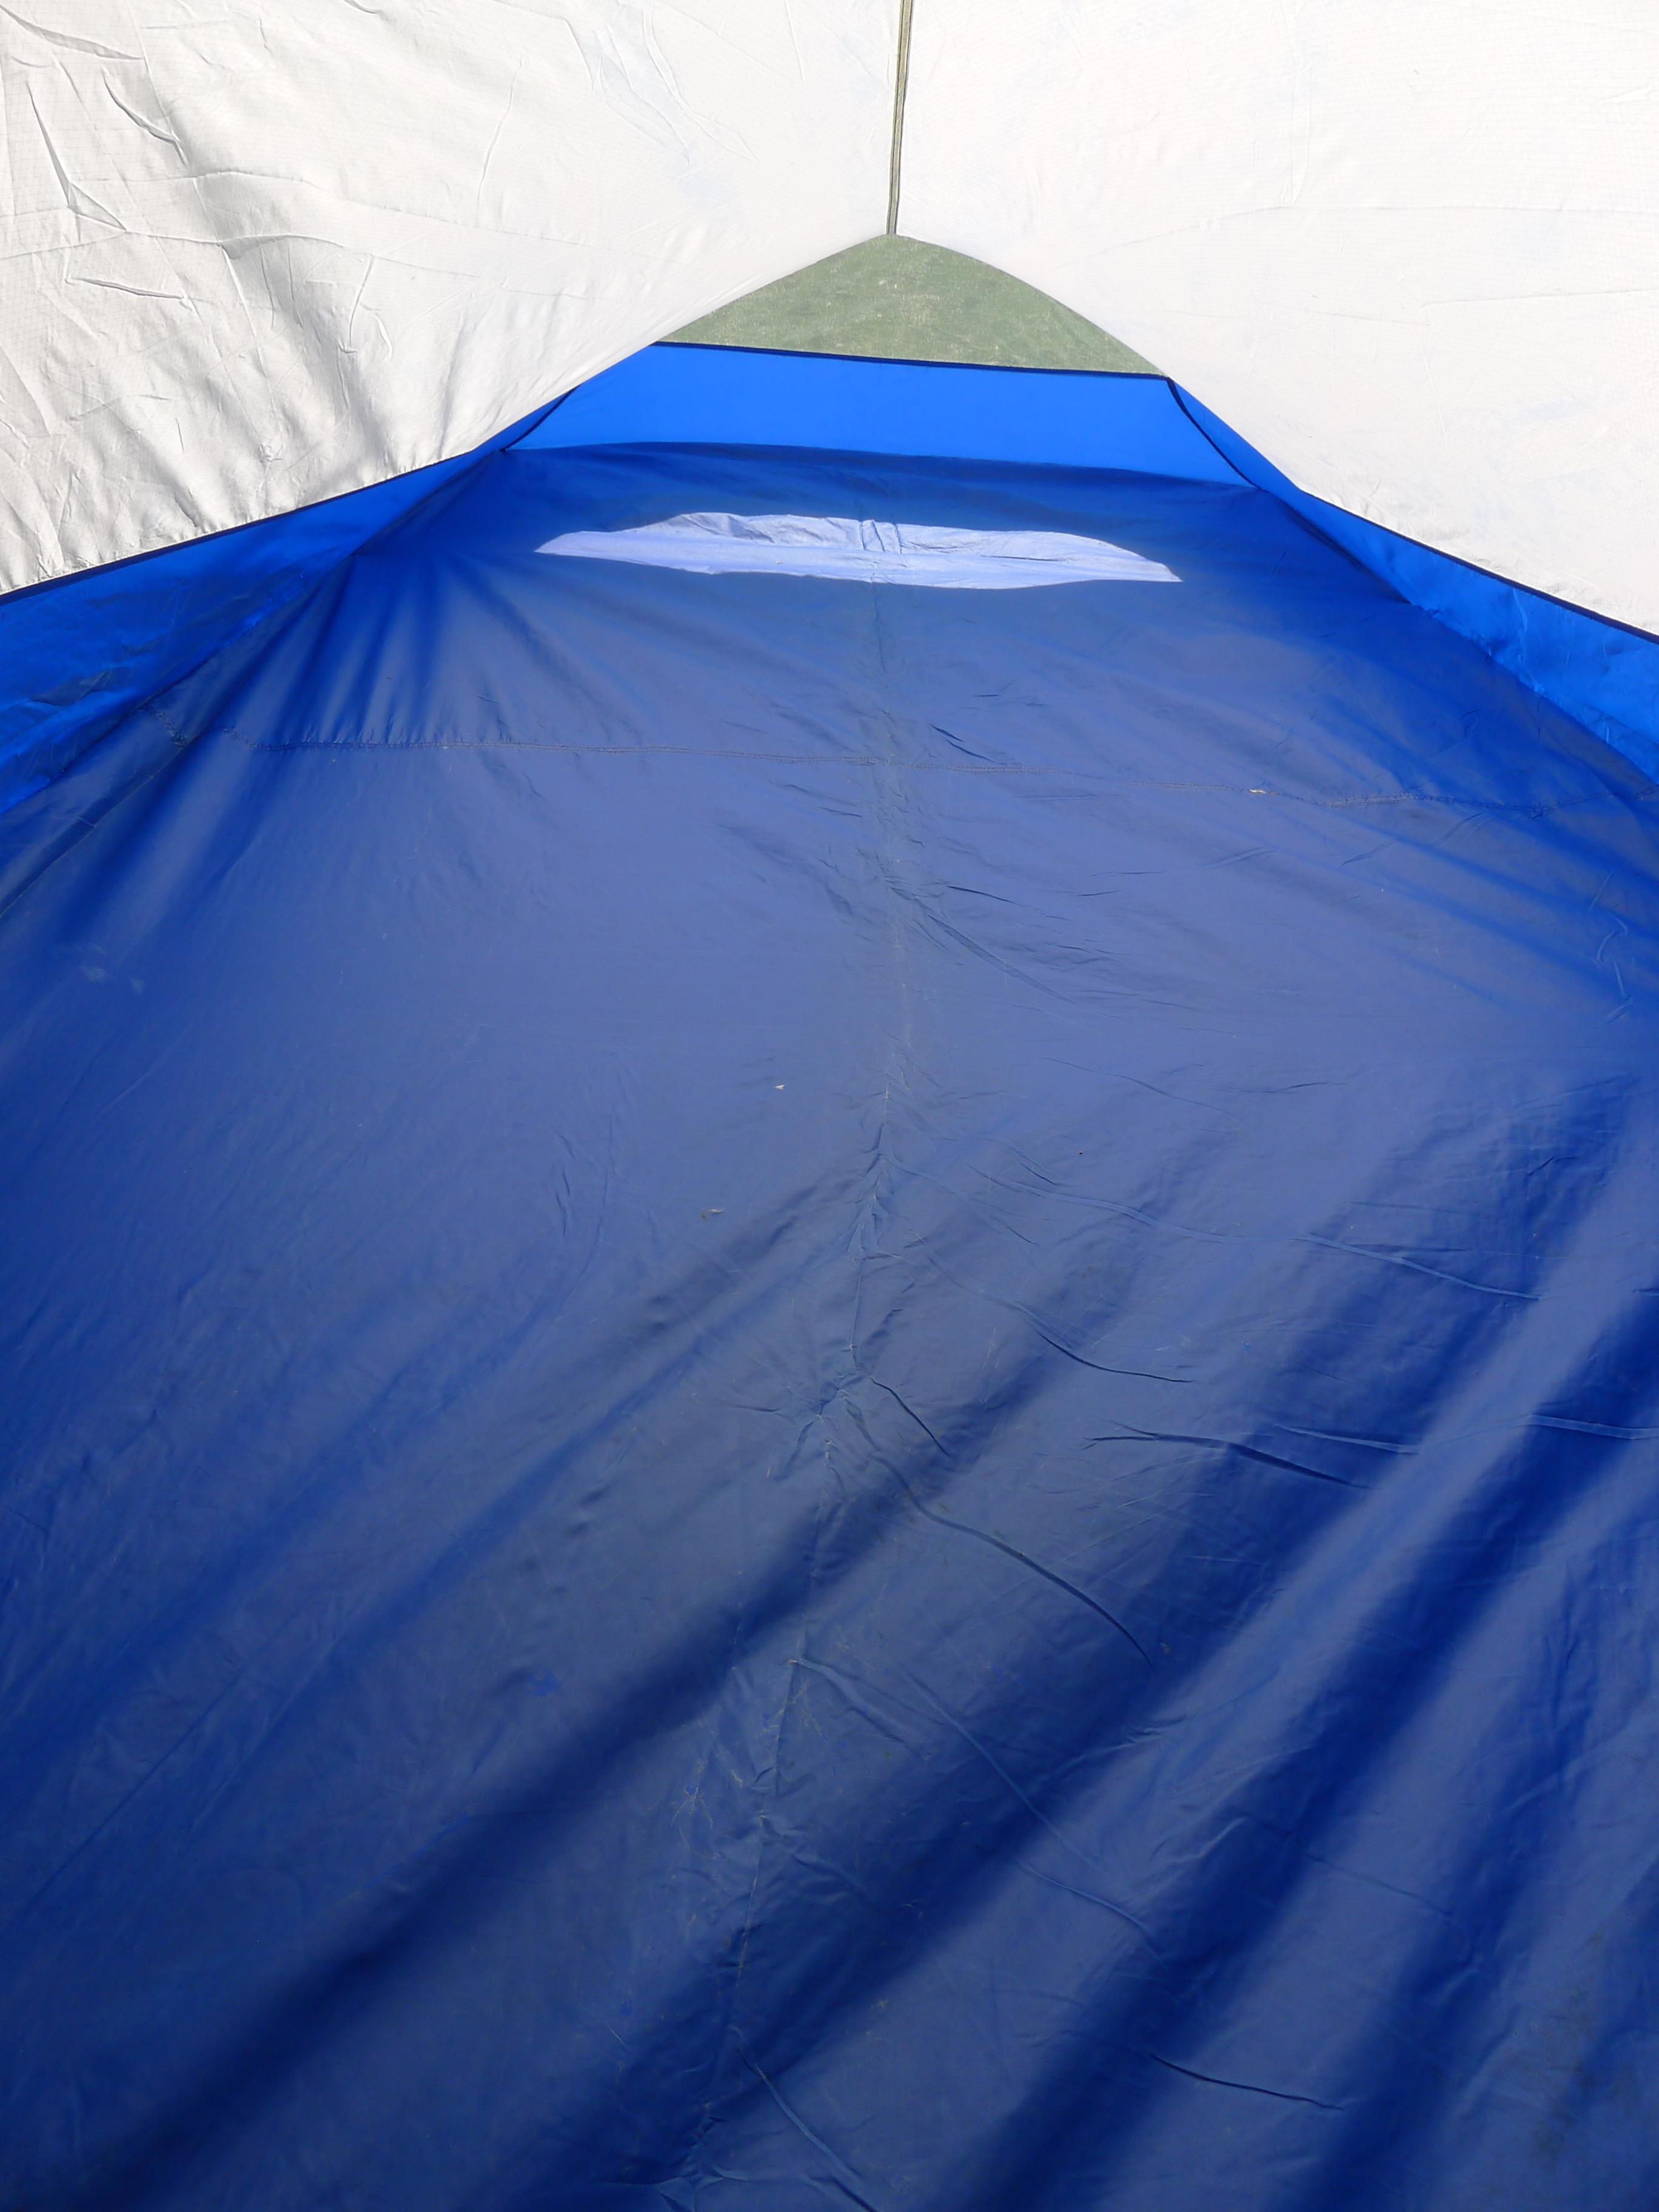 Vintage Sierra Designs single Man Backpacking Tent u2013 Oakland CA Made in the USA & Vintage Sierra Designs single Man Backpacking Tent u2013 Oakland CA ...